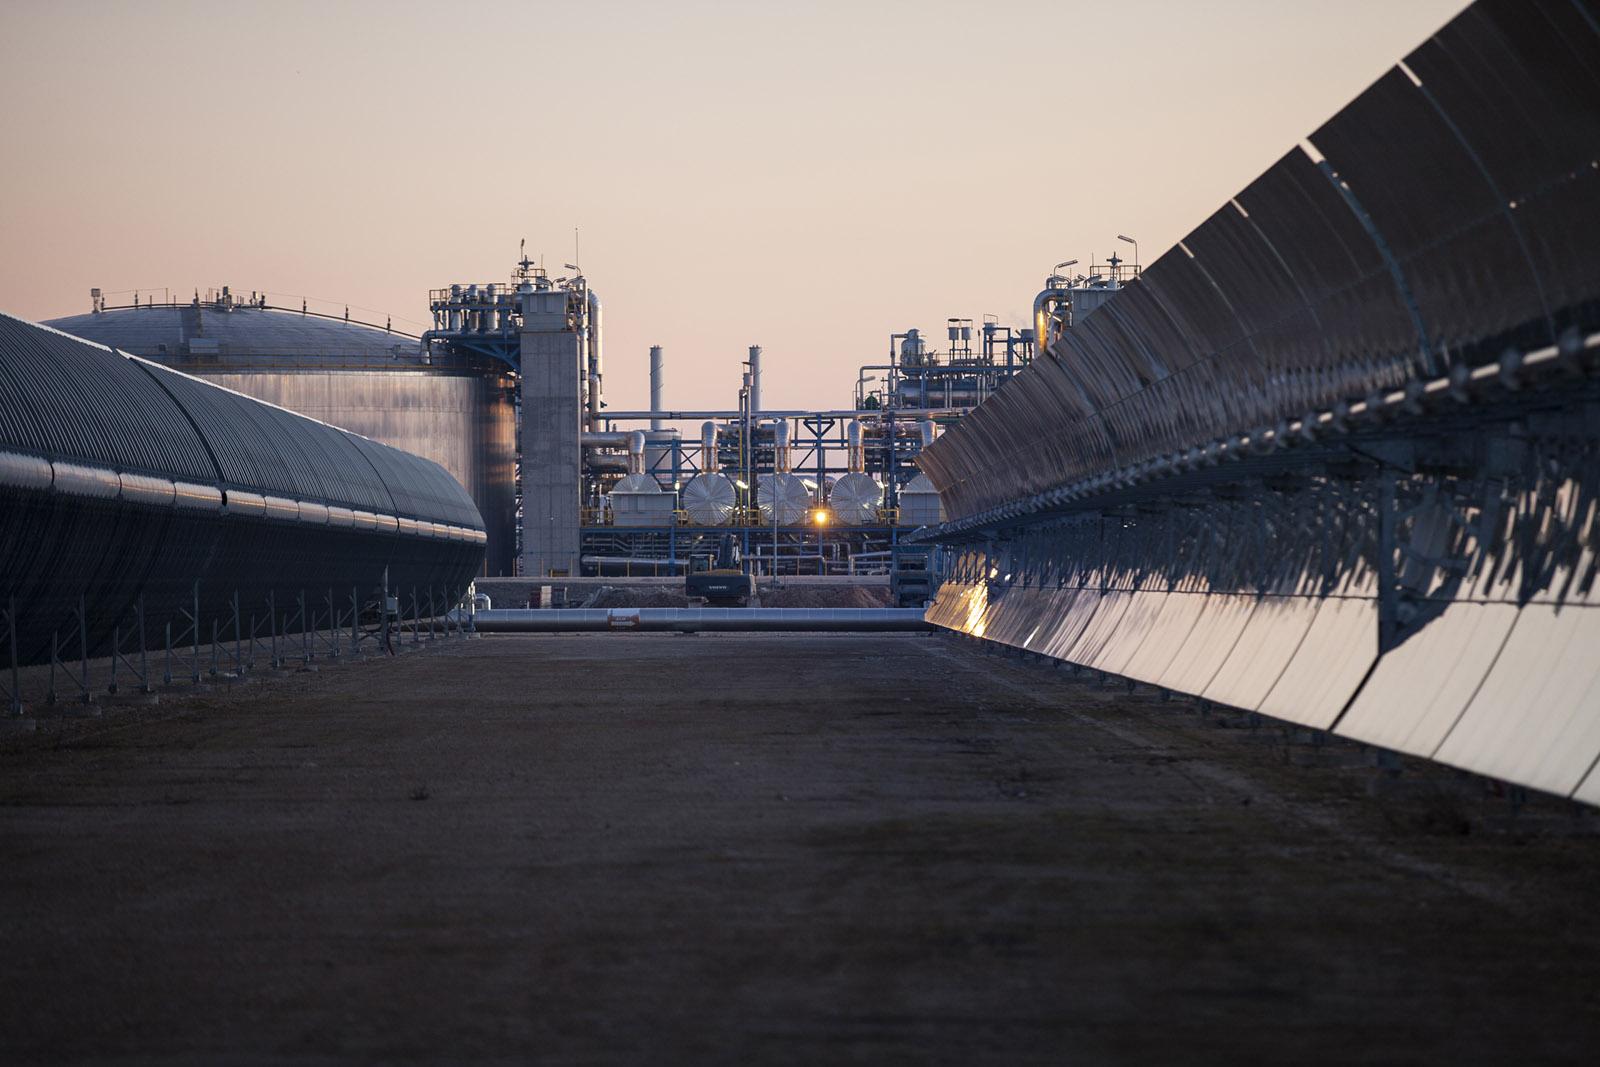 corporate-industrial-photographer-Madrid-Spain-766.jpg